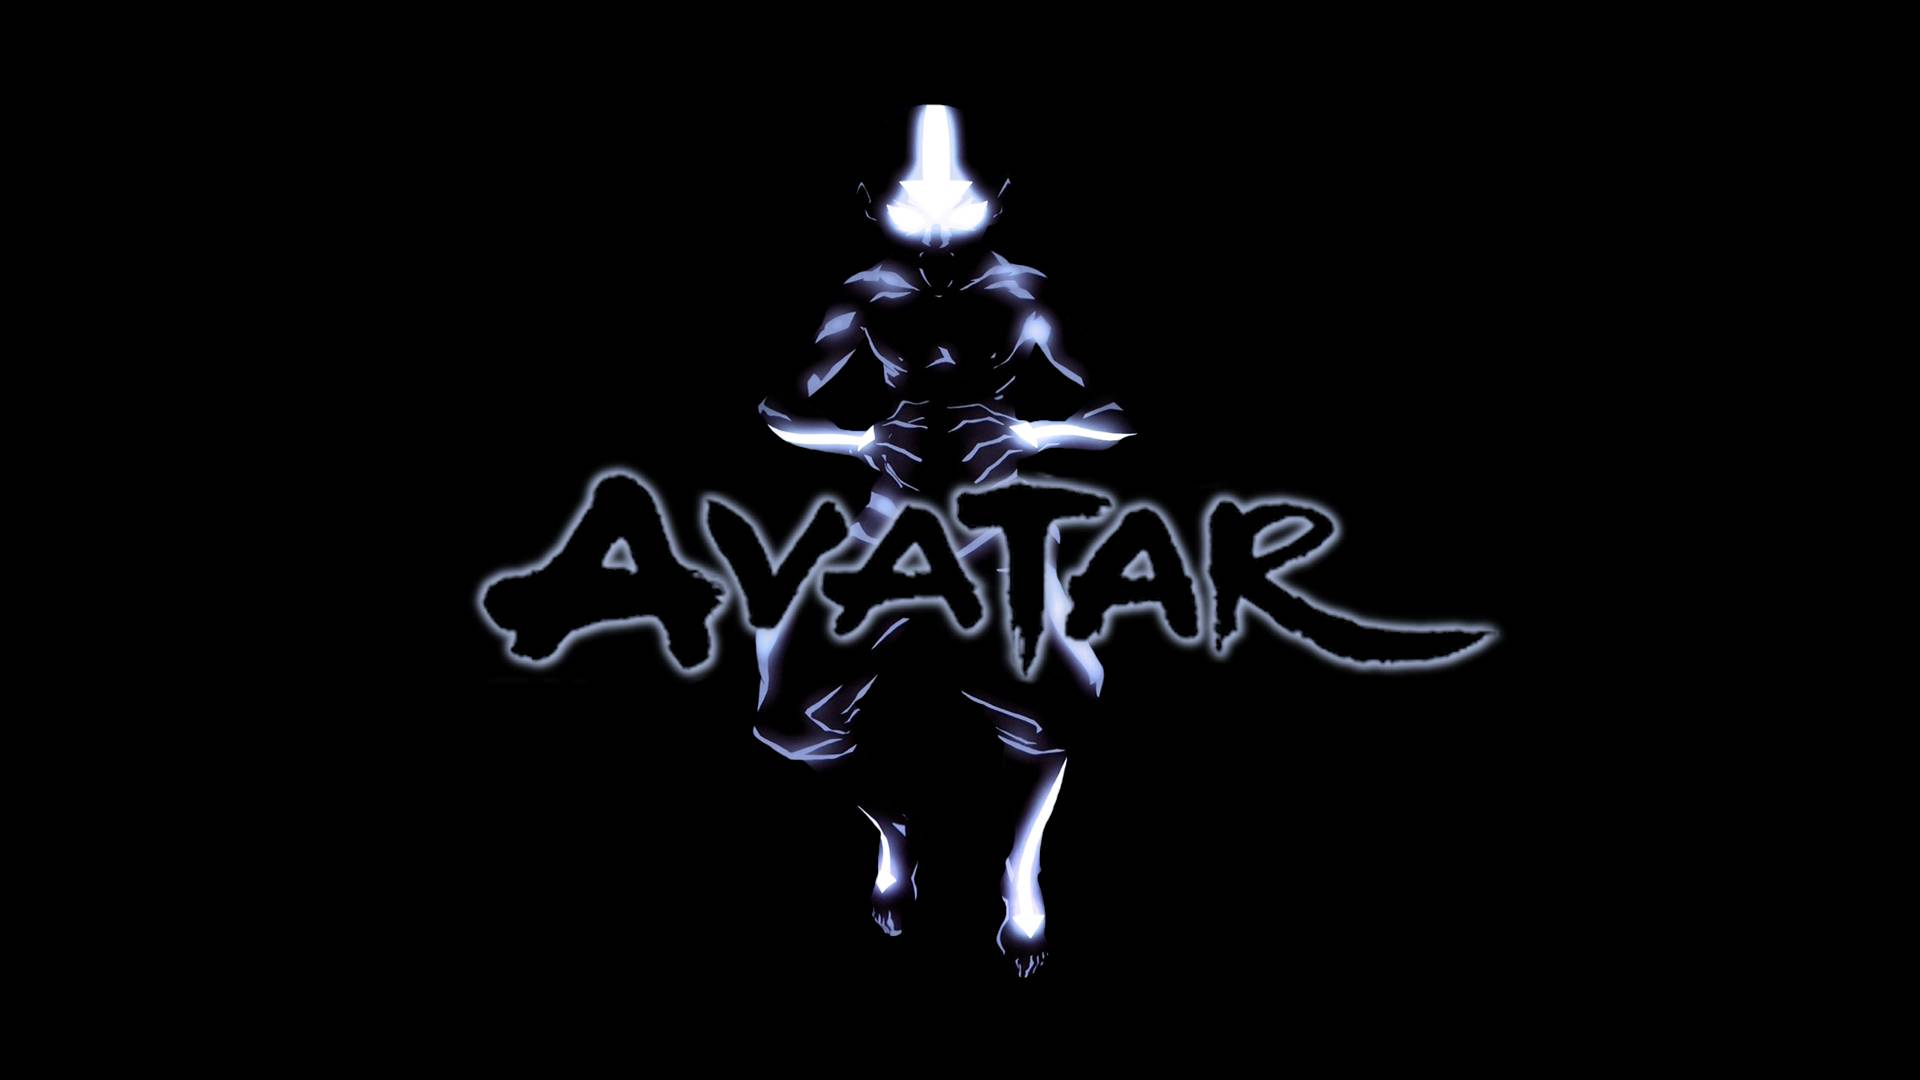 Free Download Avatar The Last Airbender Desktop Wallpapers